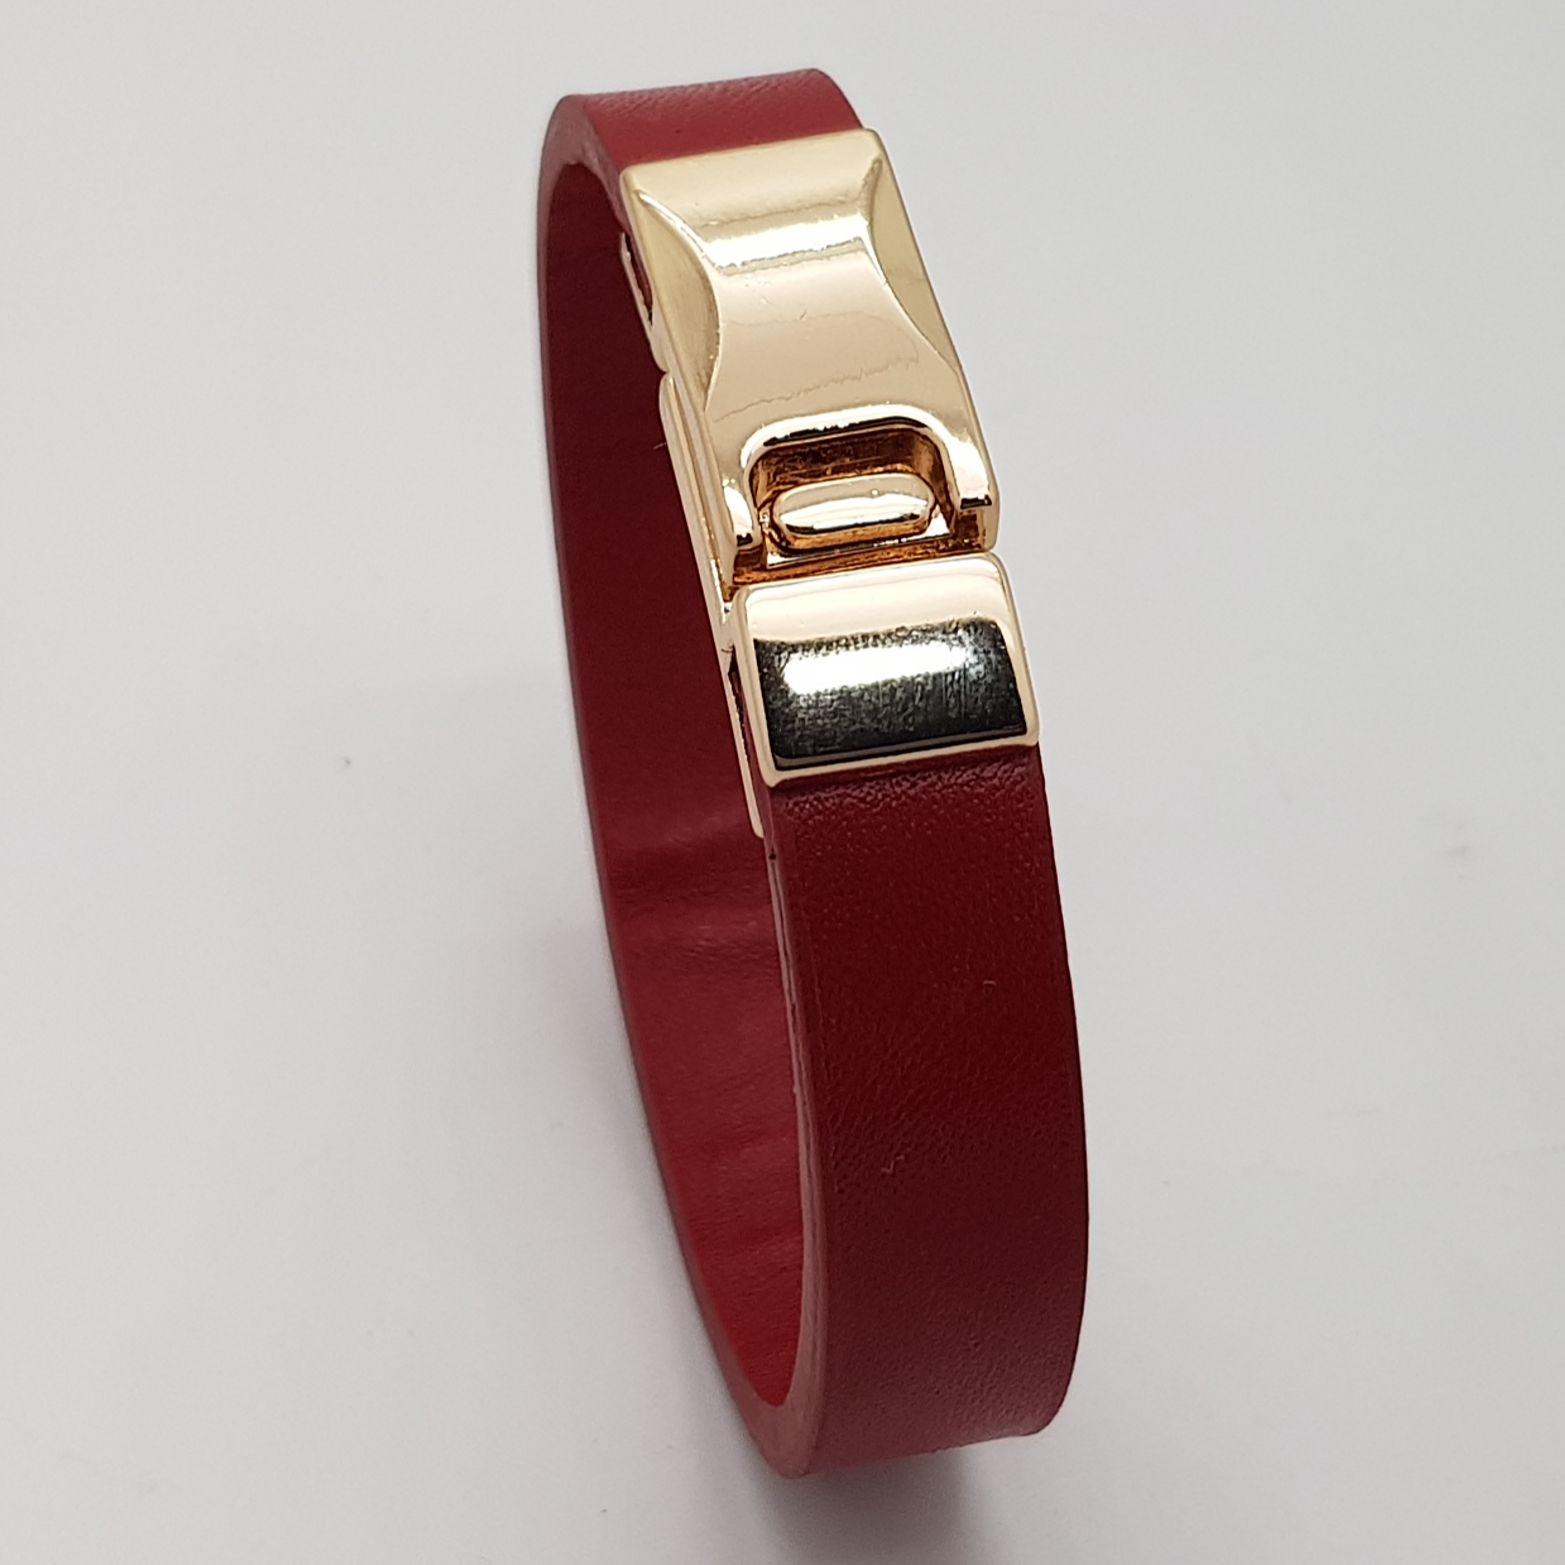 دستبند کد ۱۲۰ thumb 2 8